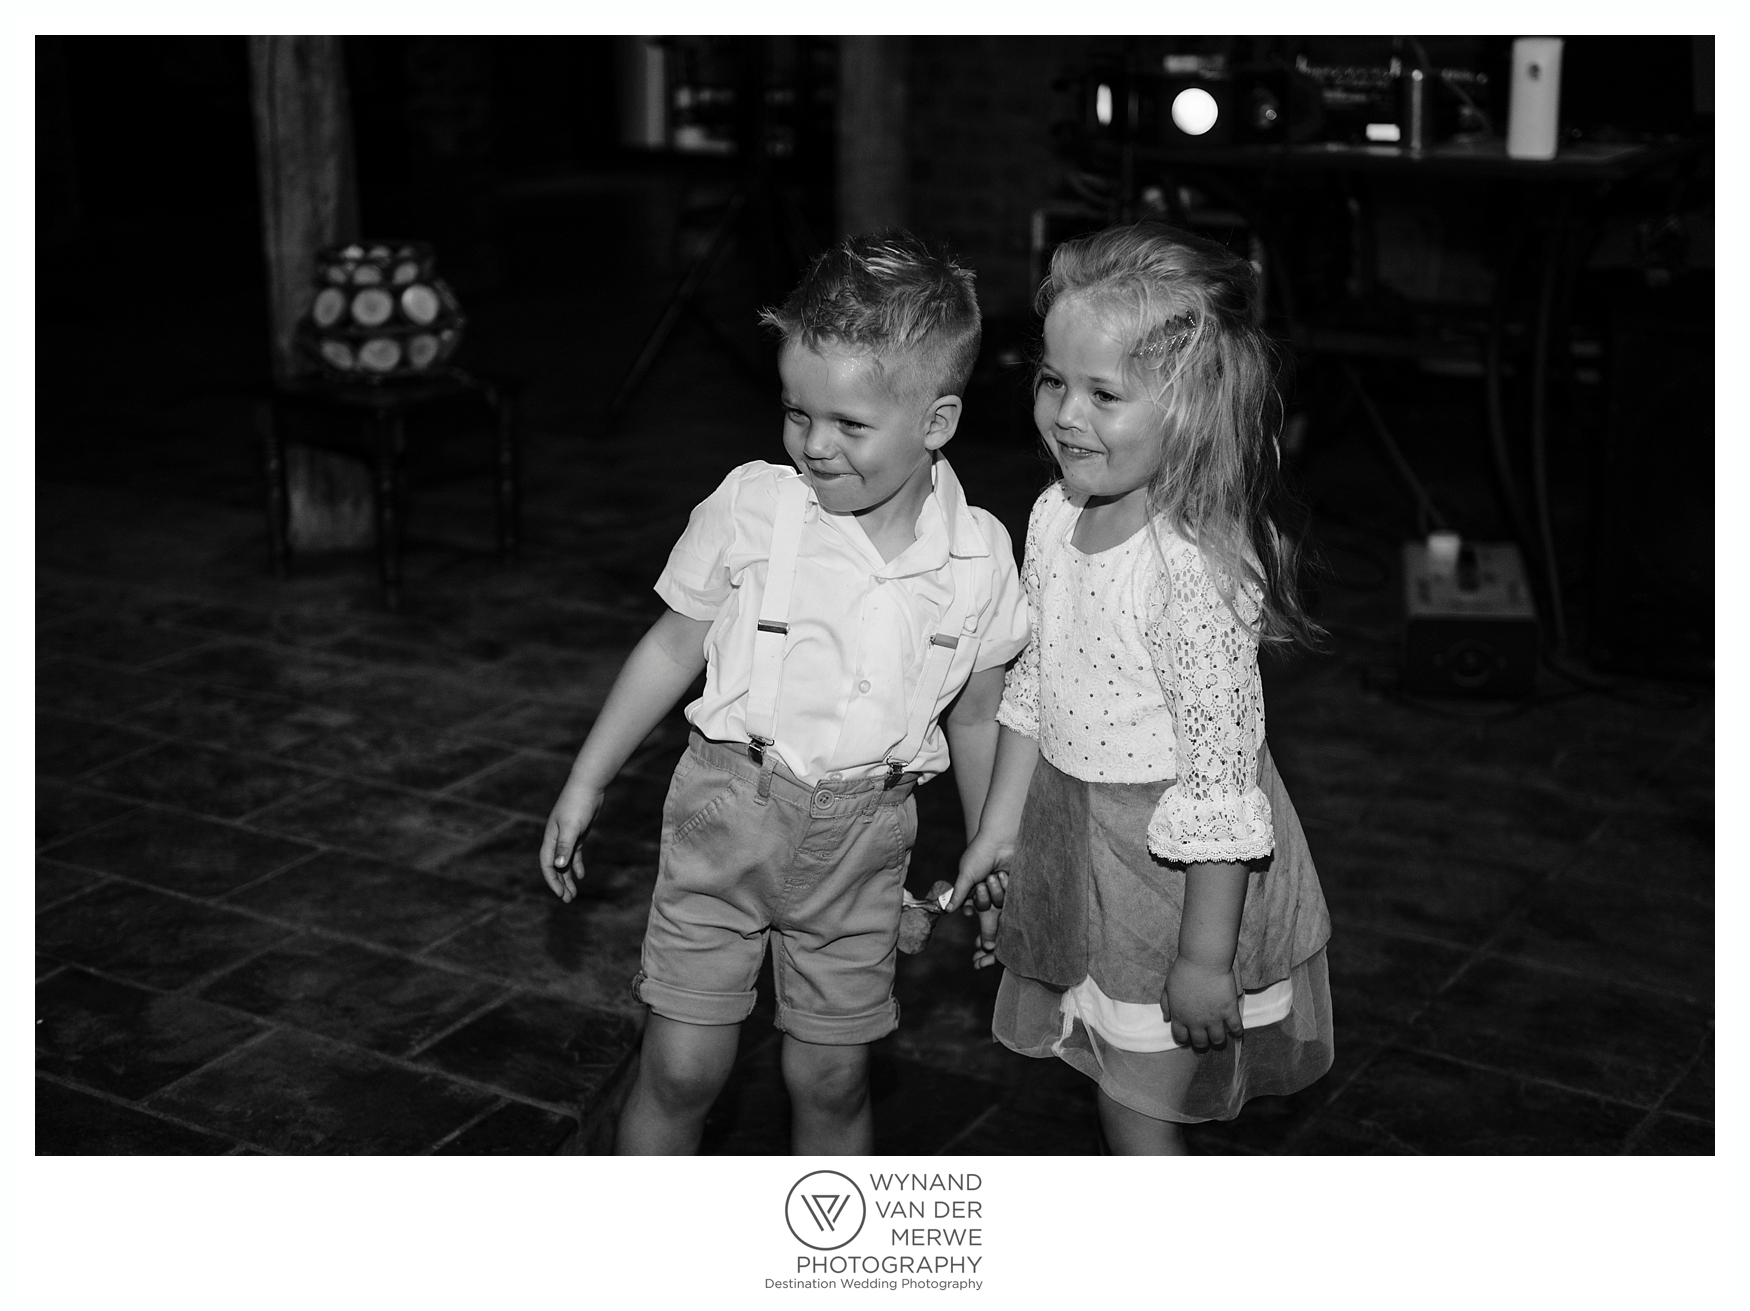 WynandvanderMerwe_weddingphotography_bushveldwedding_northam_bushveld_limpopowedding_limpopo_southafrica-424.jpg